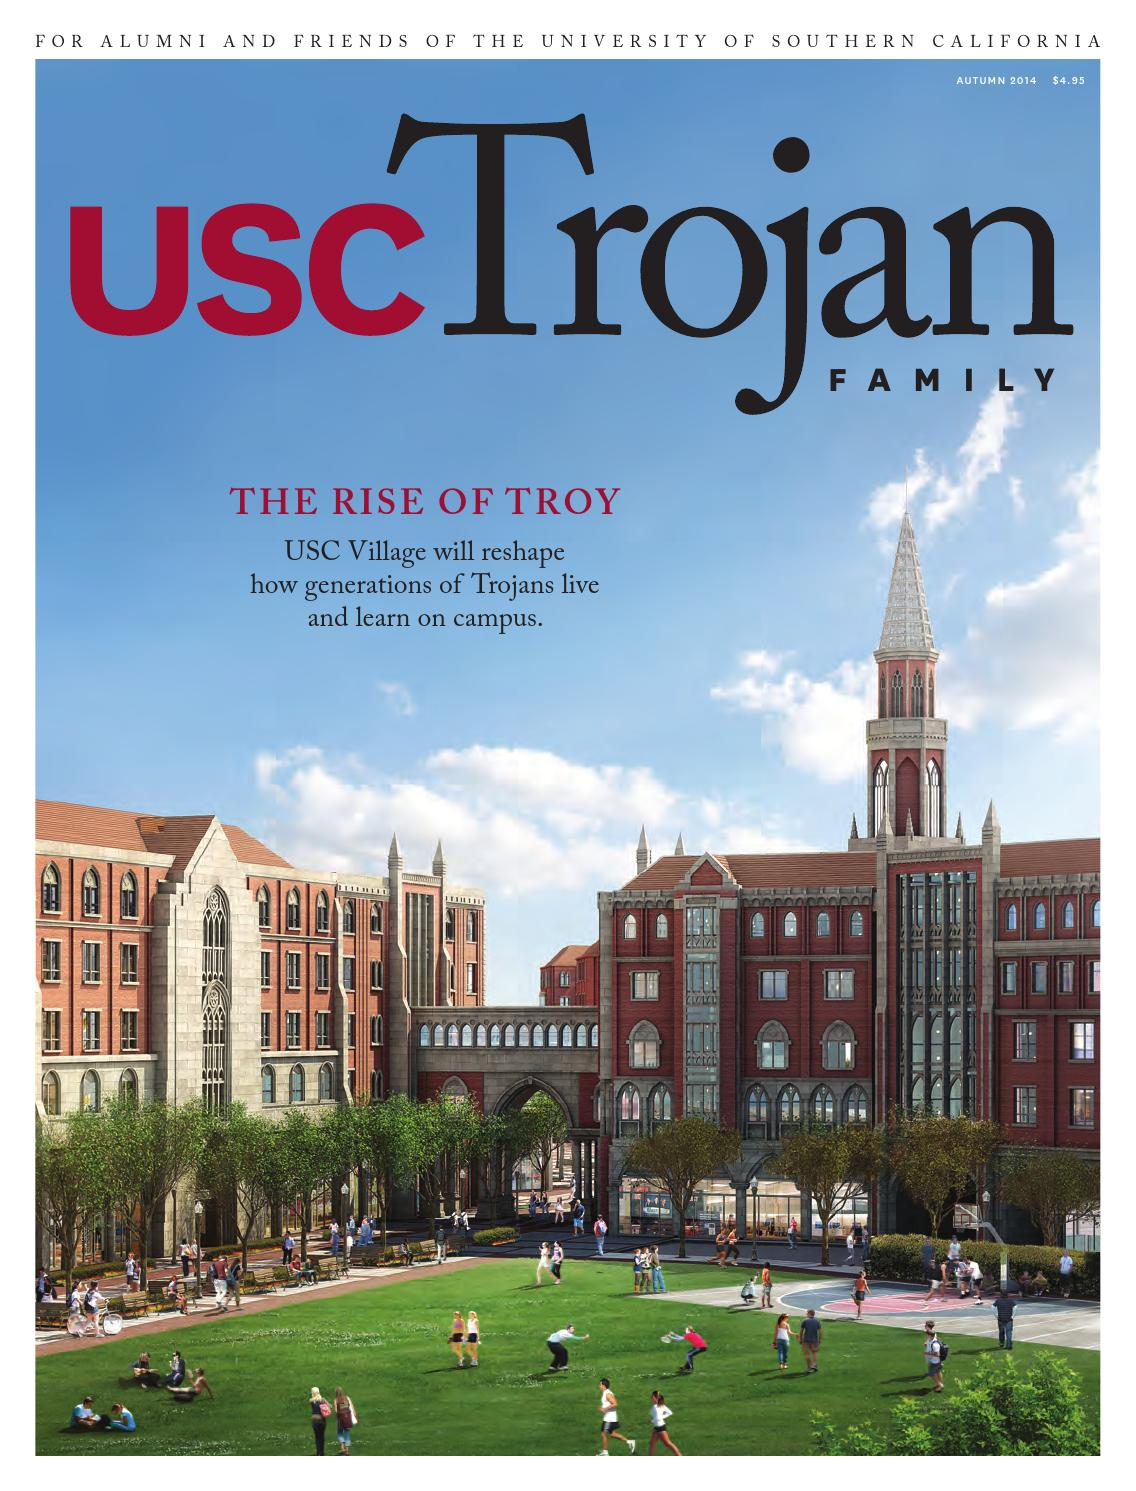 Trojan Family Magazine Autumn 2014 by University of Southern